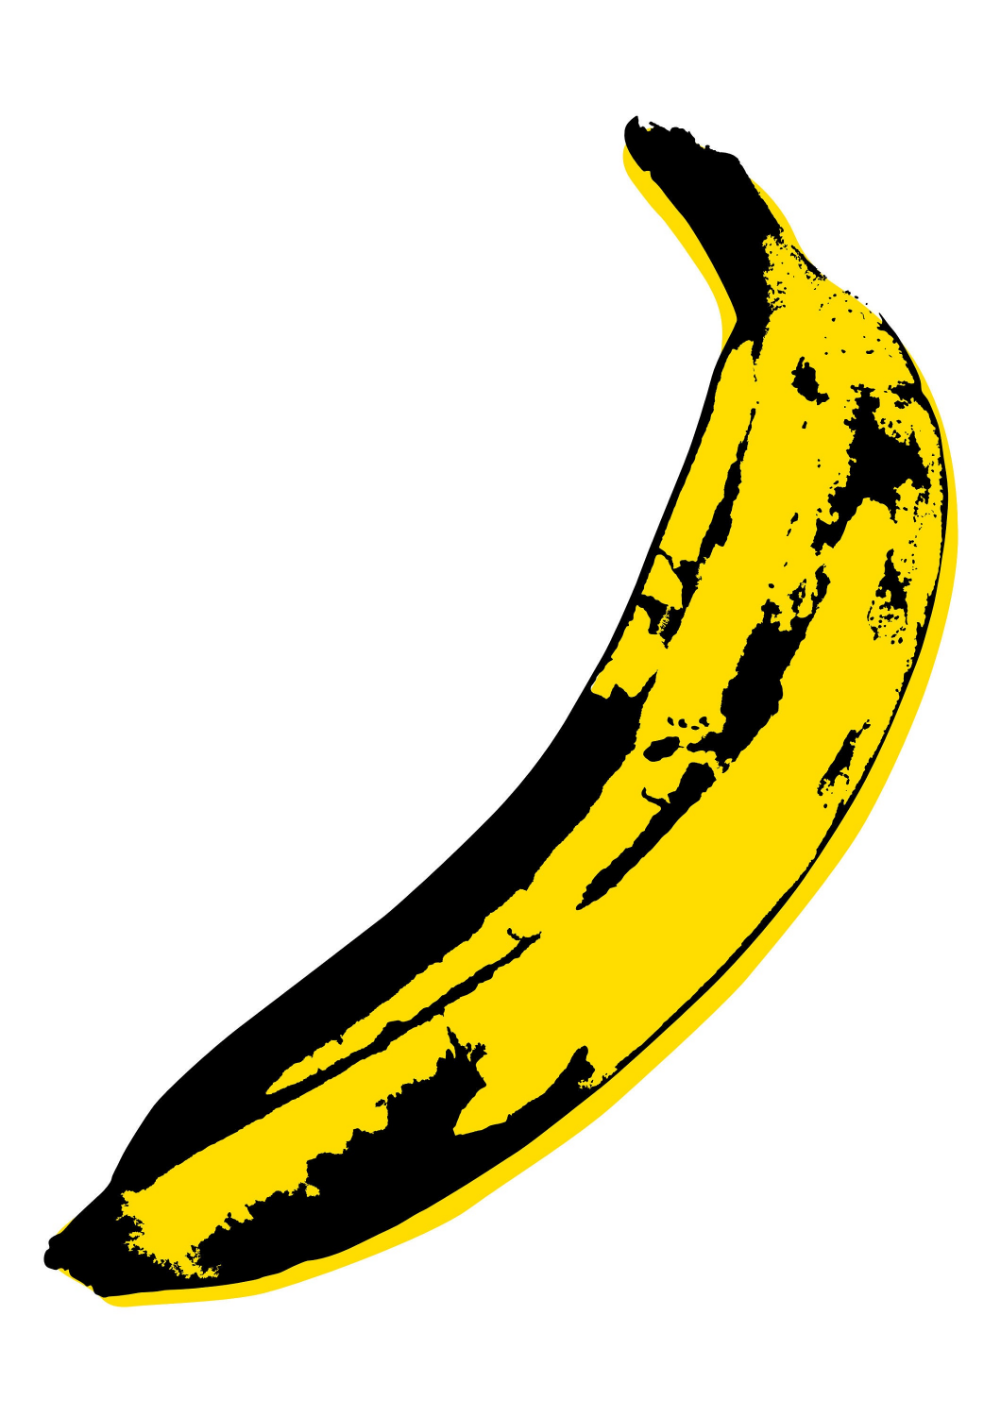 Pop Art Print Modern Art Banana Print Pop Art Poster Andy Warhol Print Velvet Underground Poster Pop Art Decor Pop Art Wall Art Banana Art #andywarhol